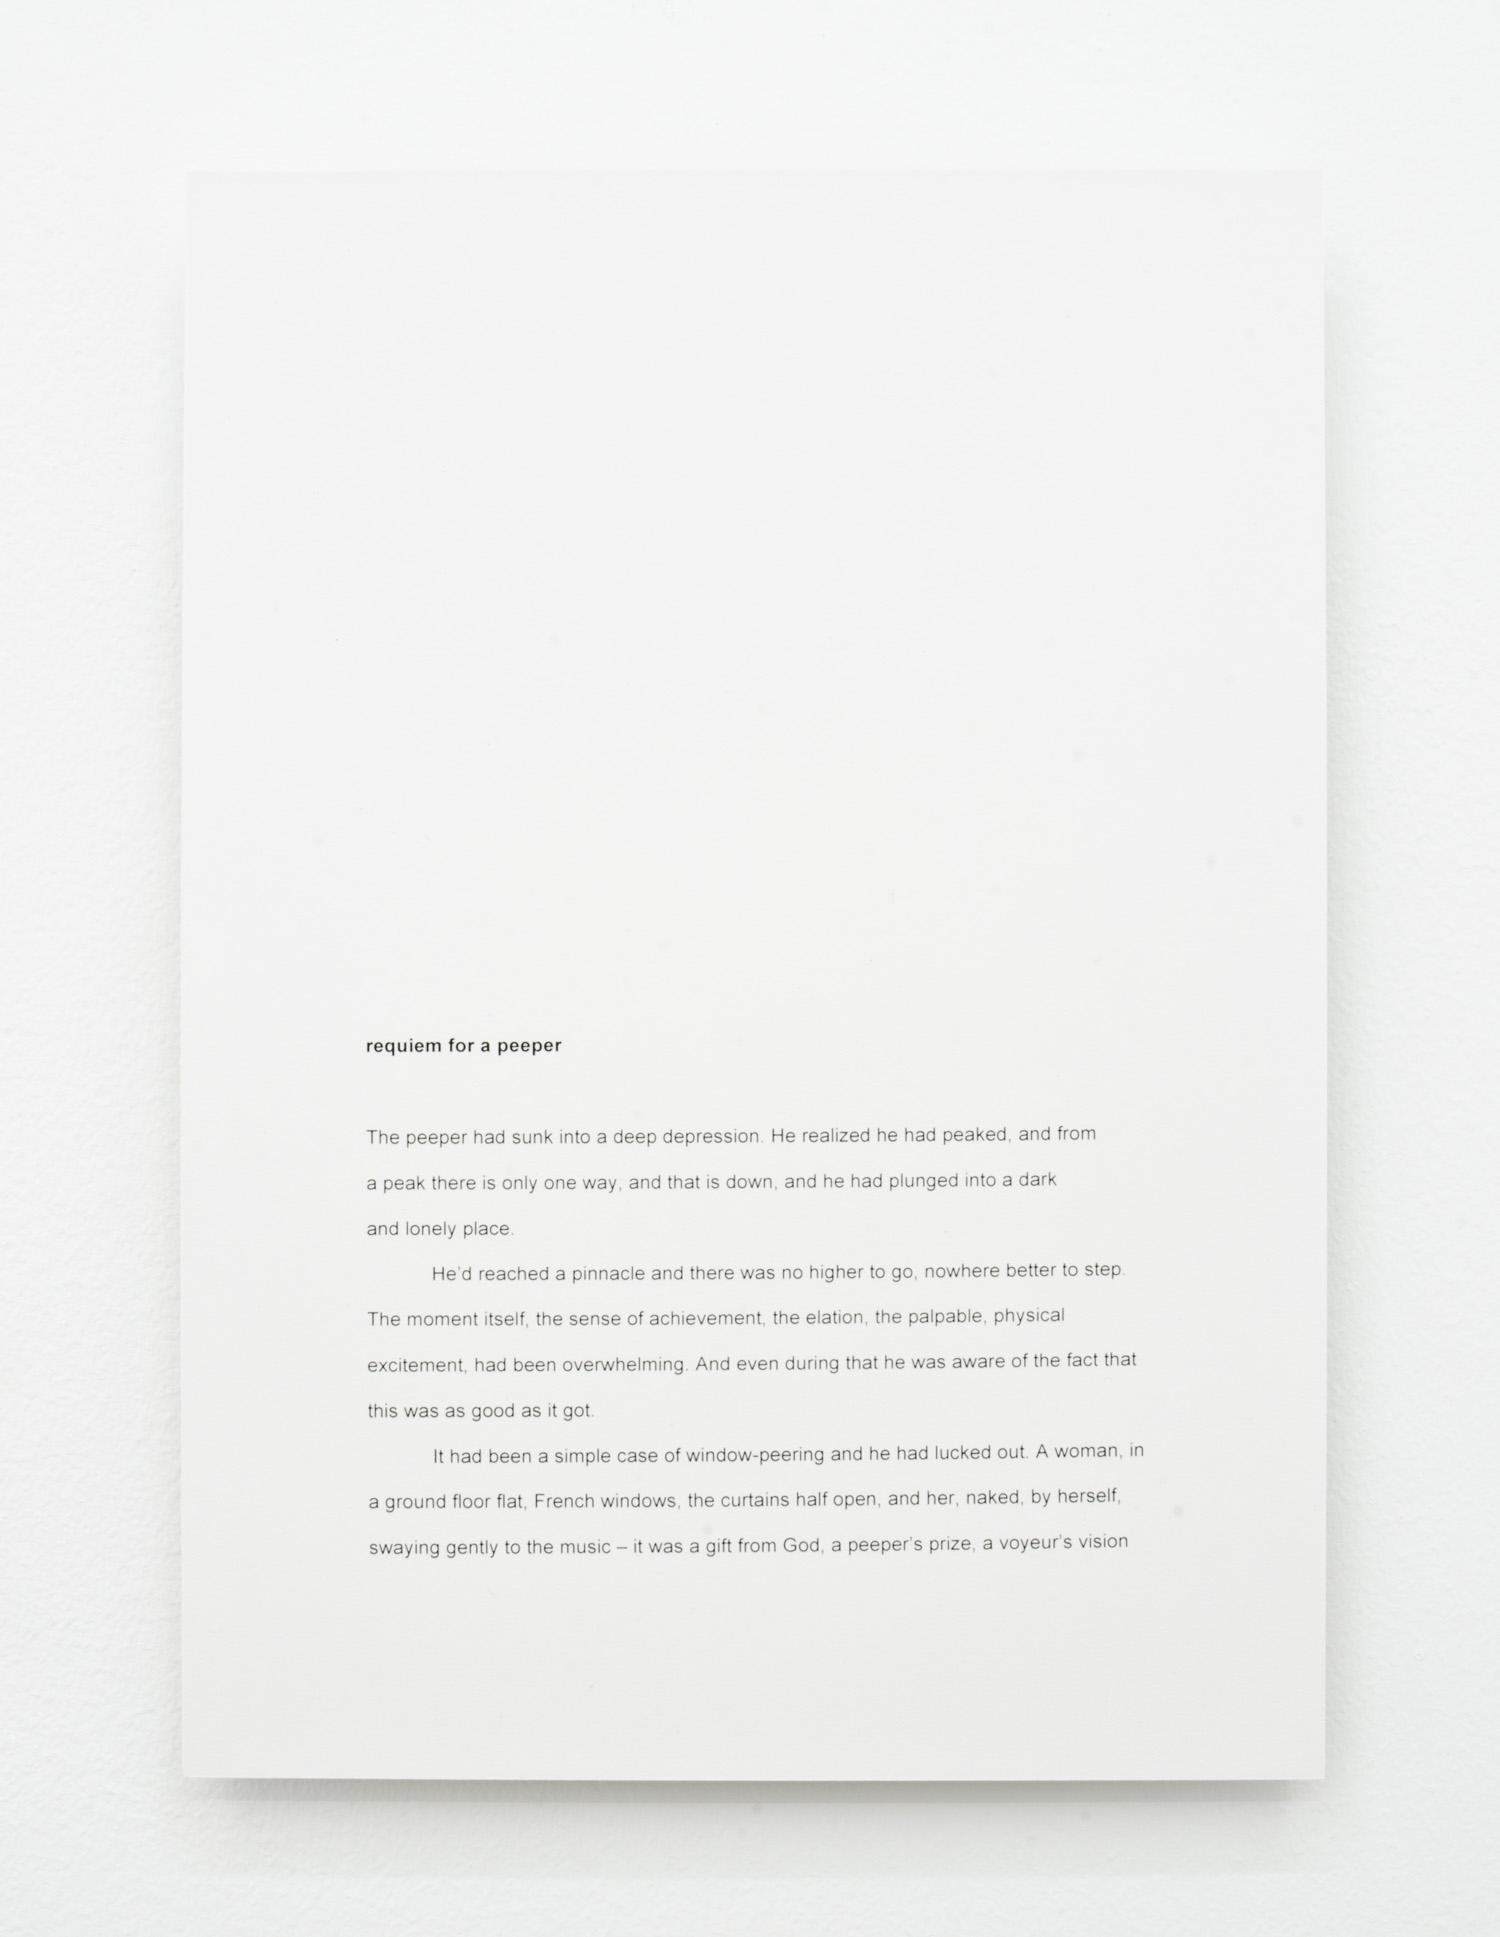 David L. Hayles, requiem for a peeper, 2014, laser print mounted on aluminium, 29.7 x 21cm.